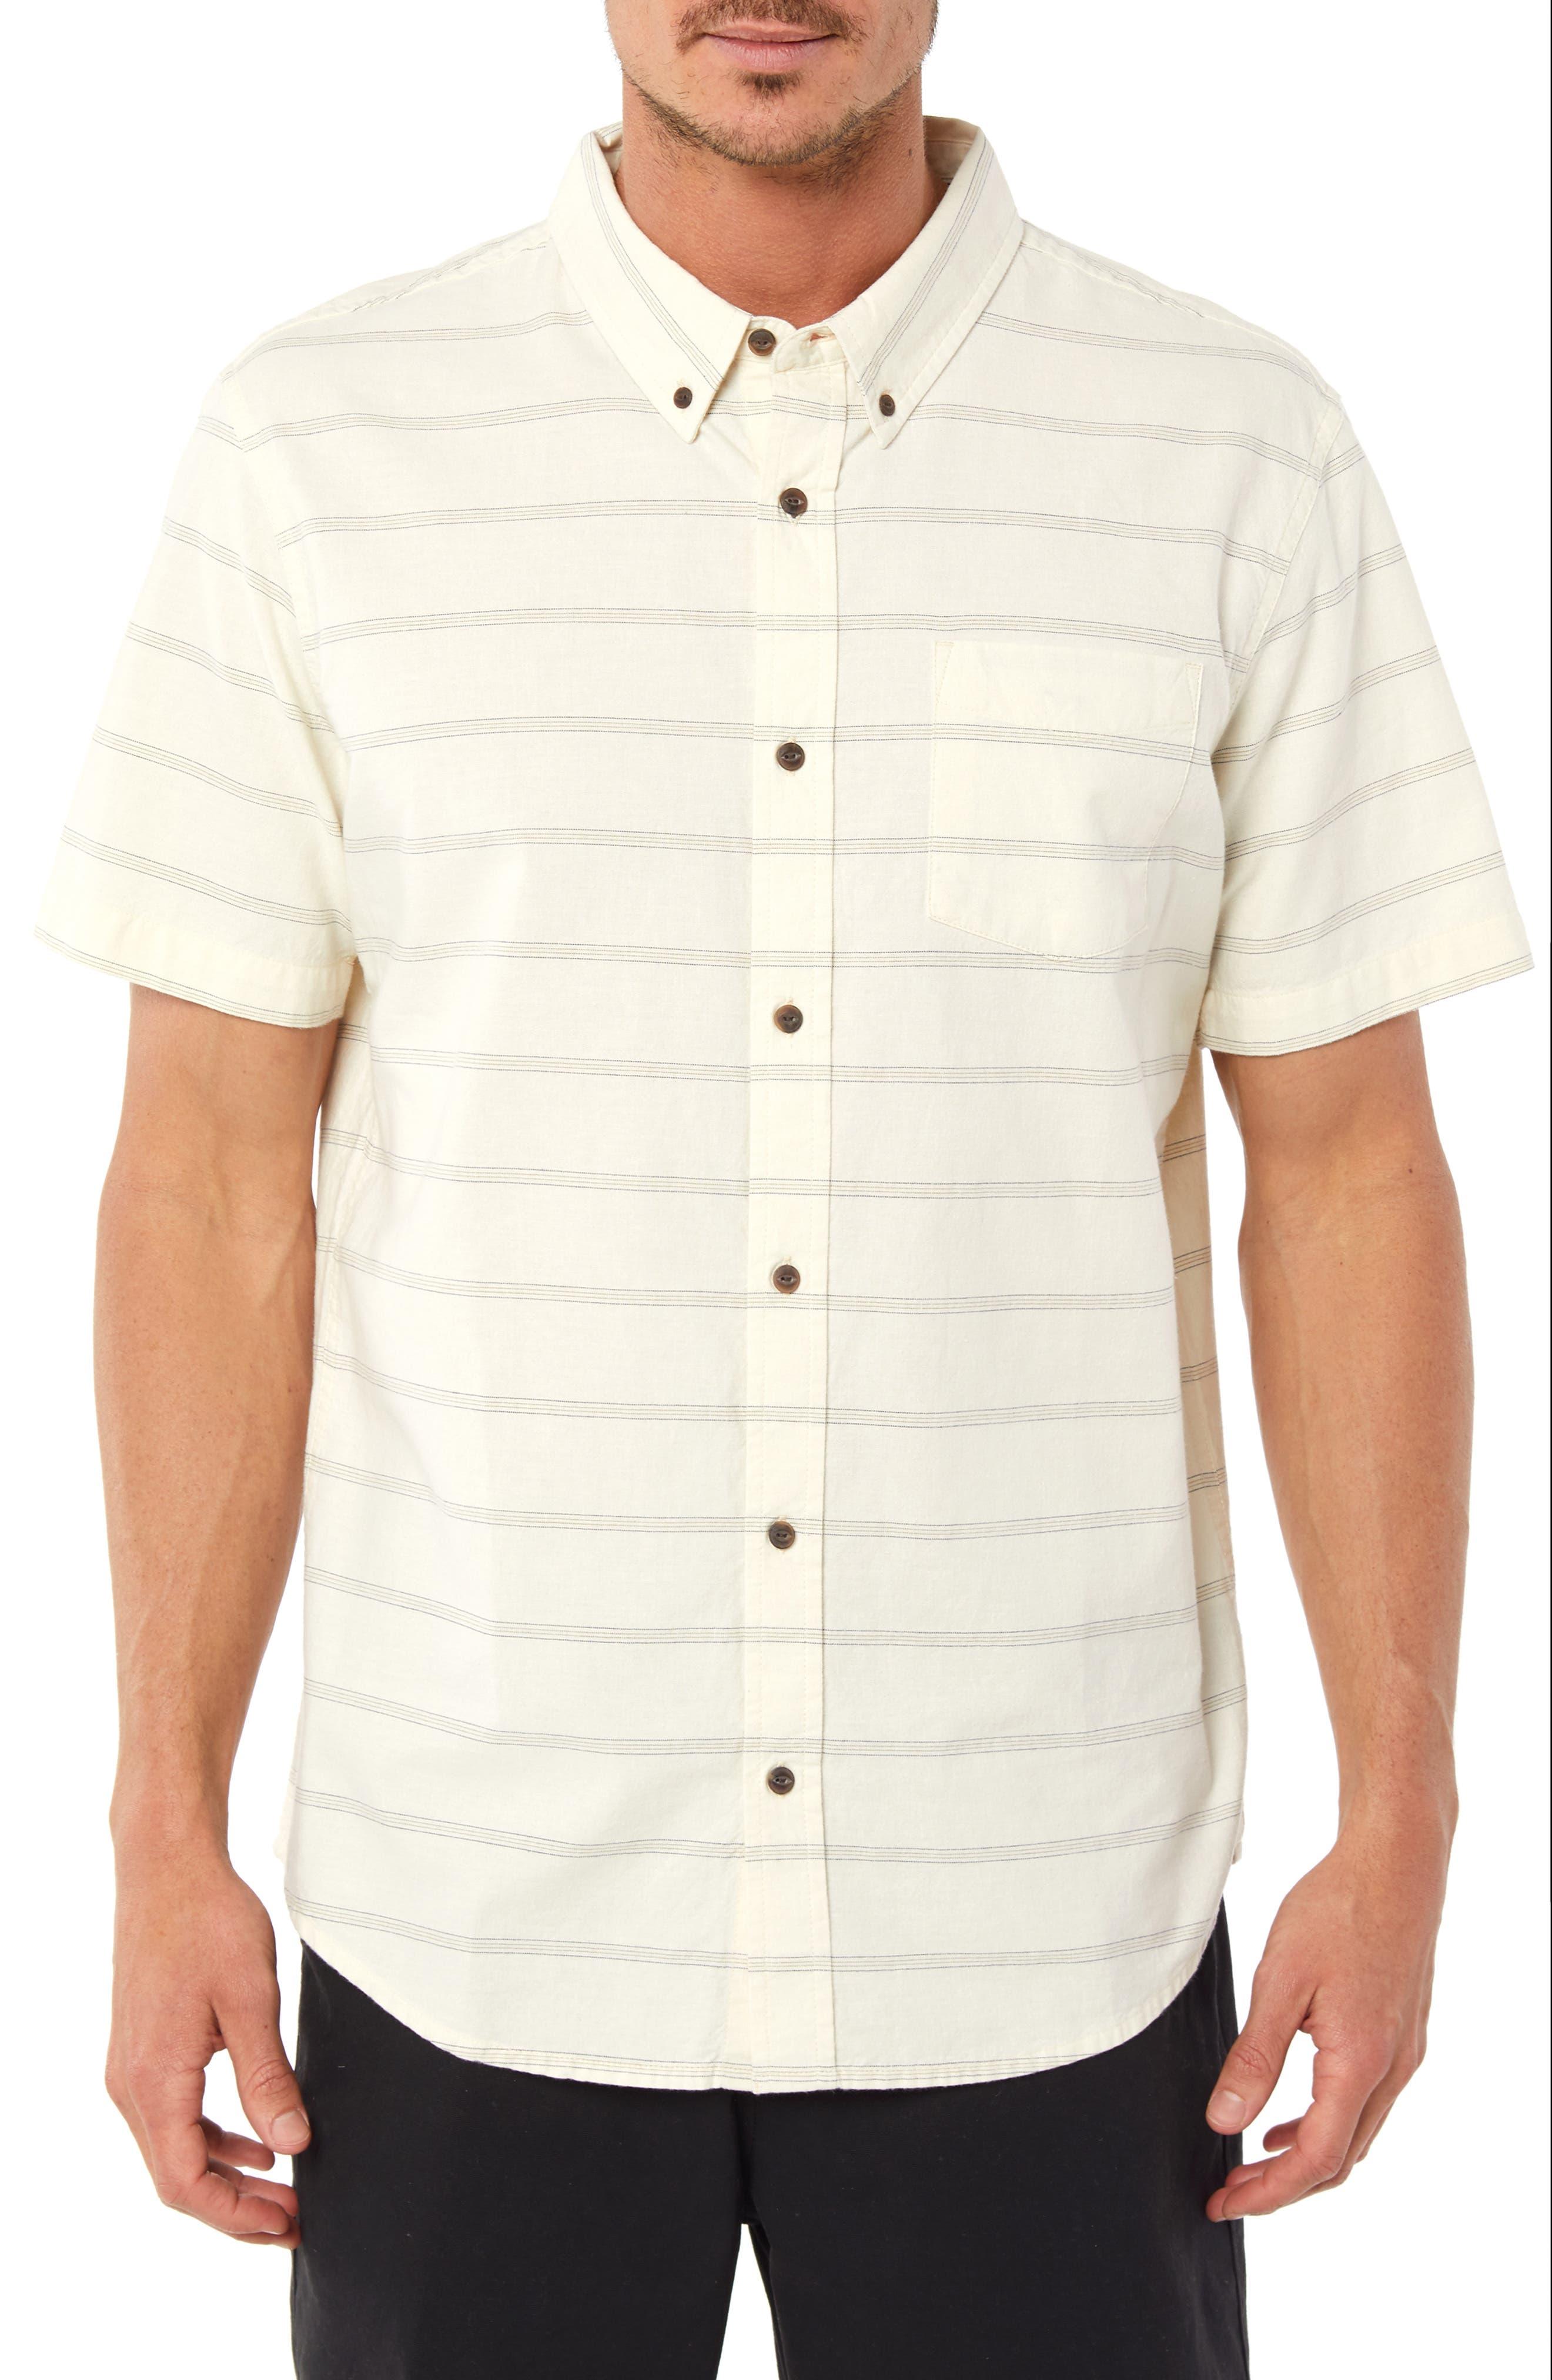 Tampico Regular Fit Sport Shirt,                             Main thumbnail 1, color,                             109